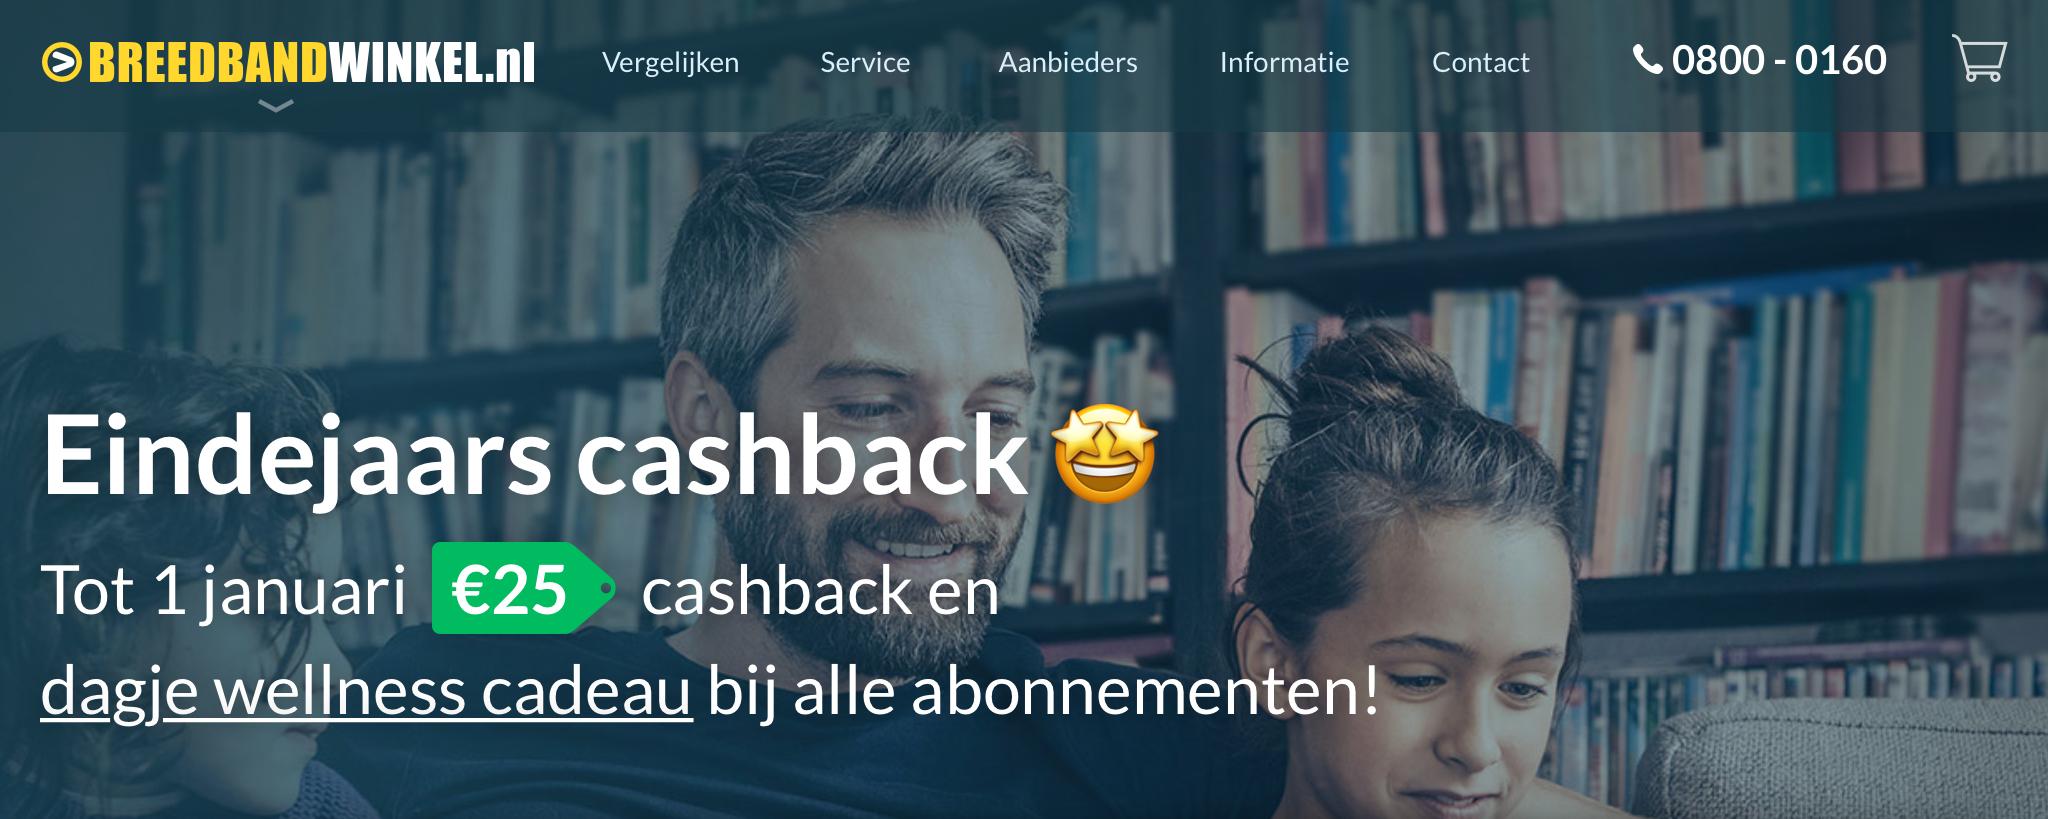 Breedbandwinkel.nl tot 1 januari: €25 cashback en een dagje wellness cadeau.